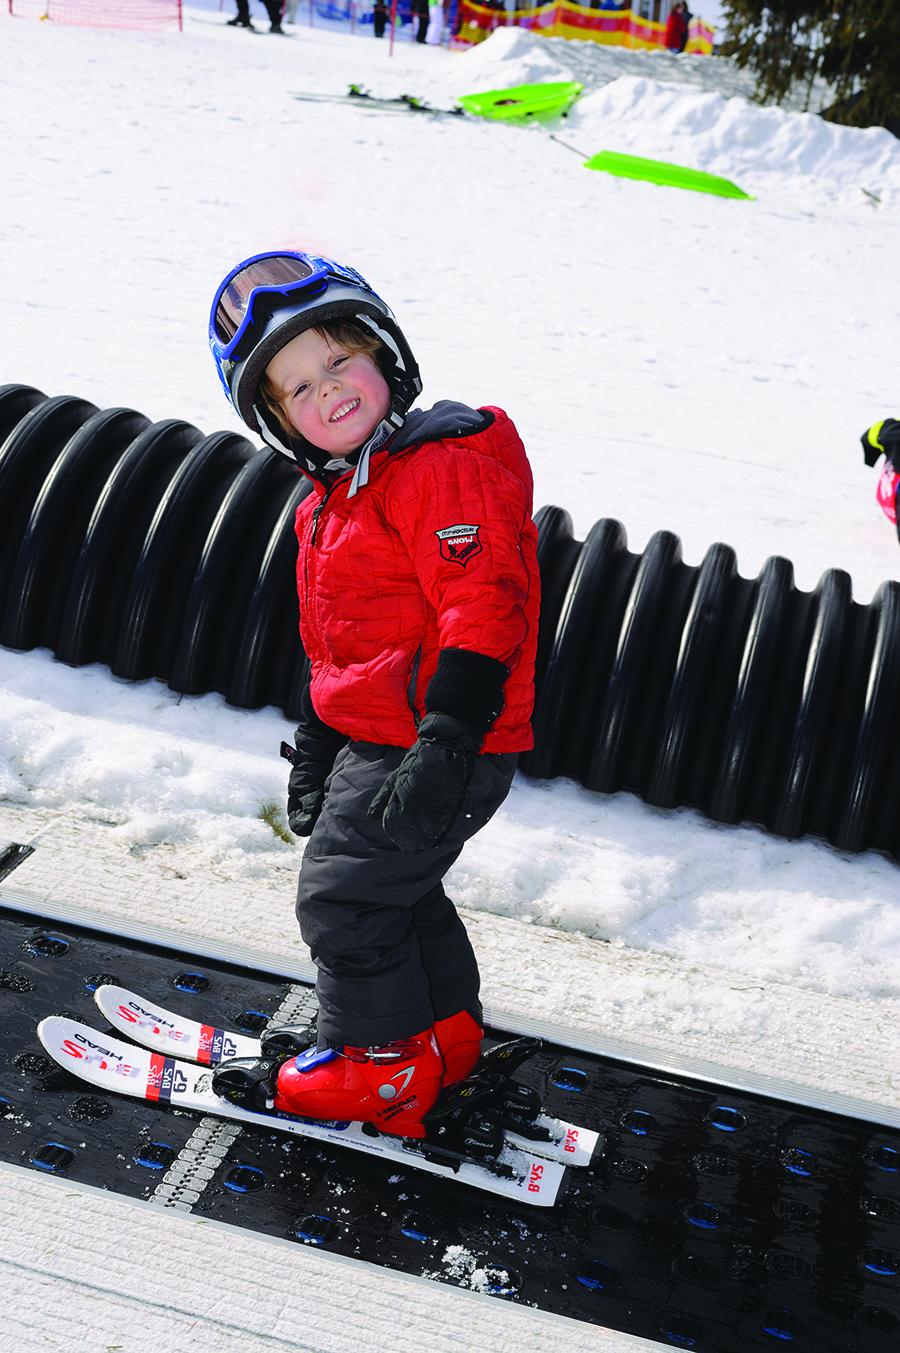 child on ski magic carpet